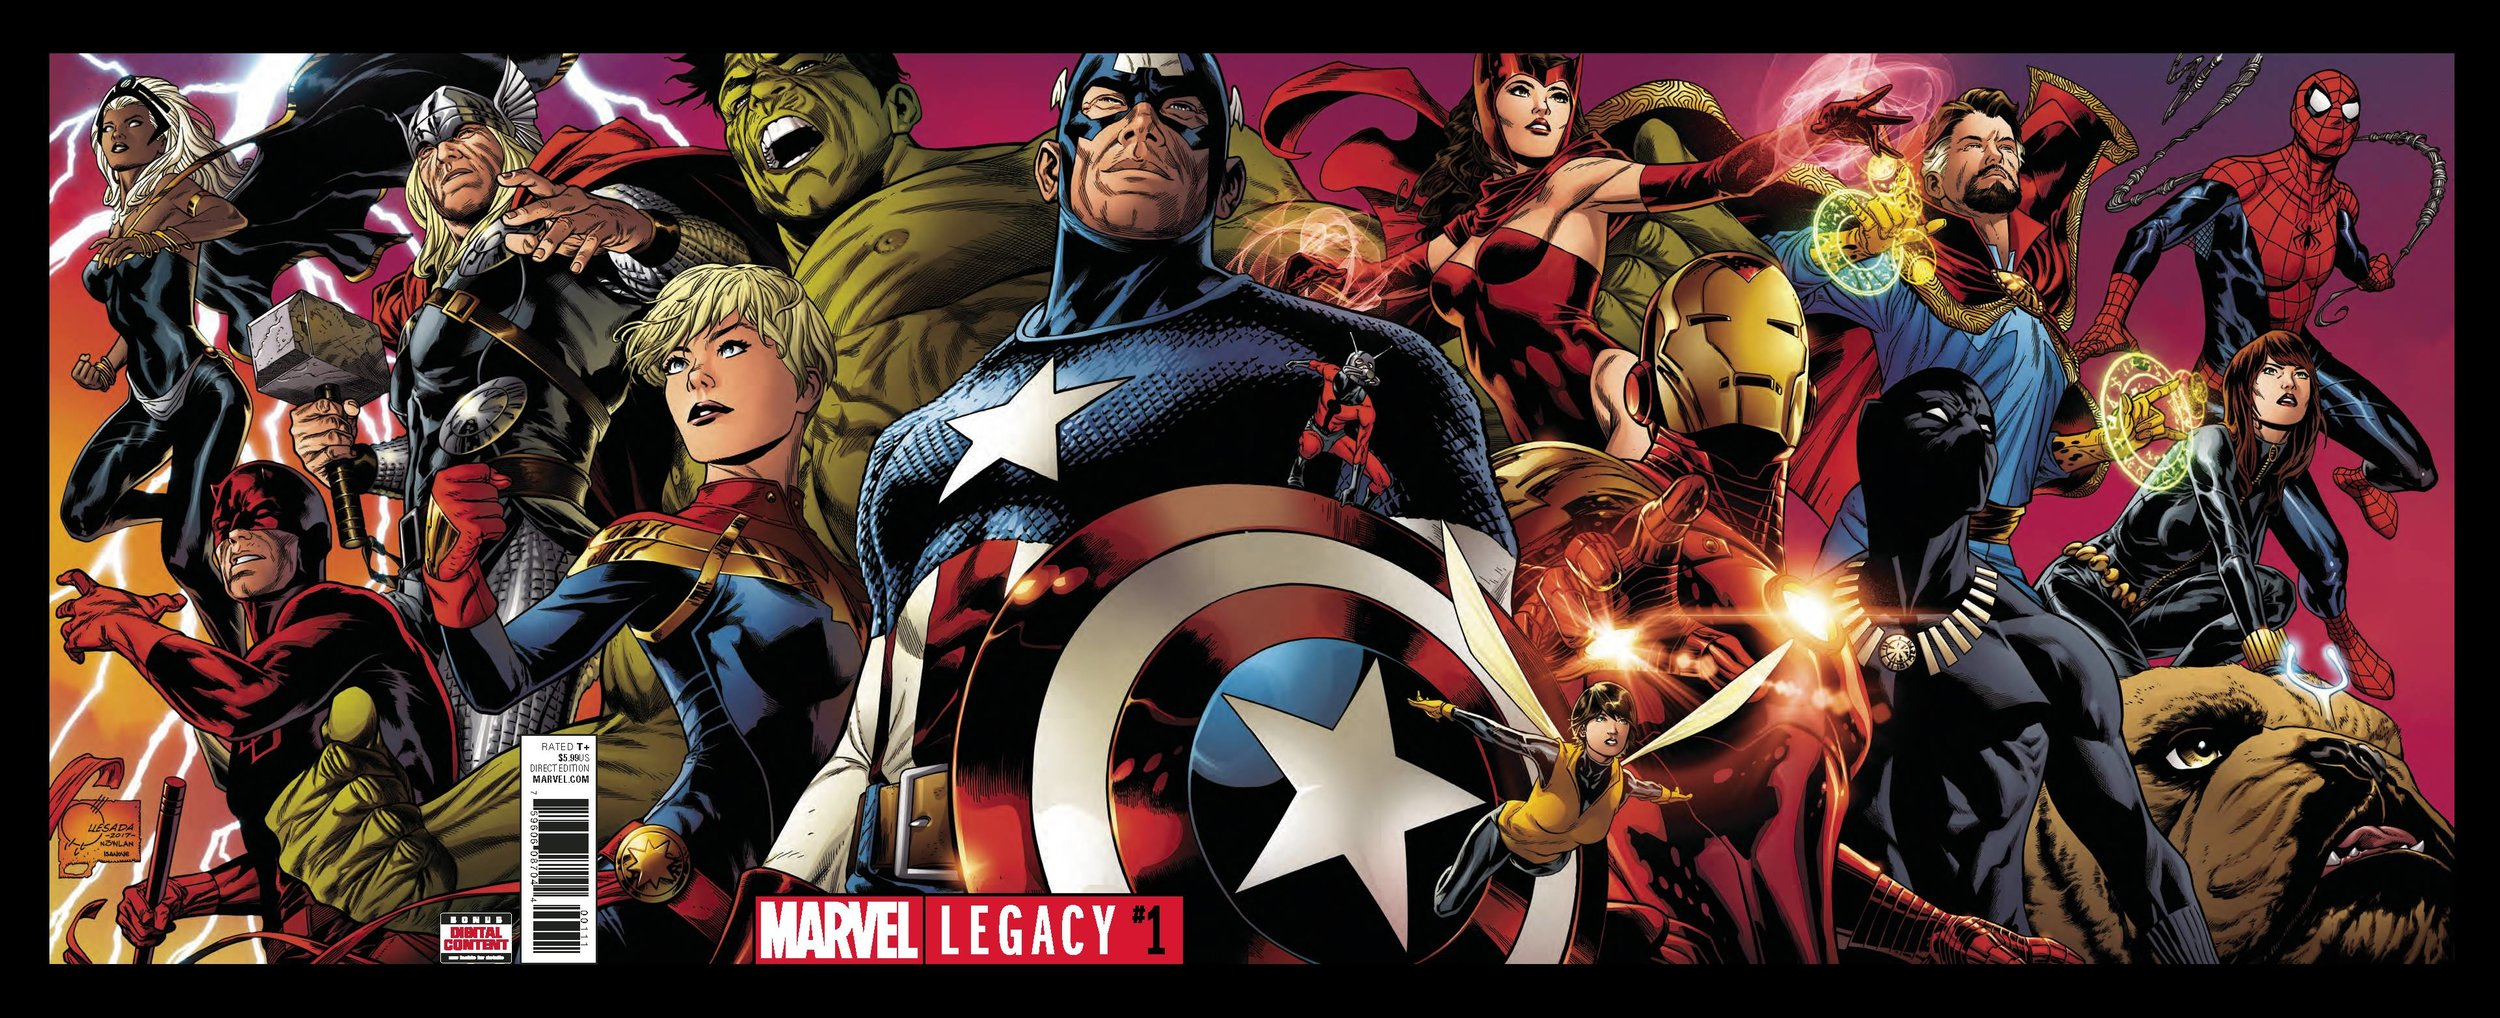 Marvel legacy1.jpg